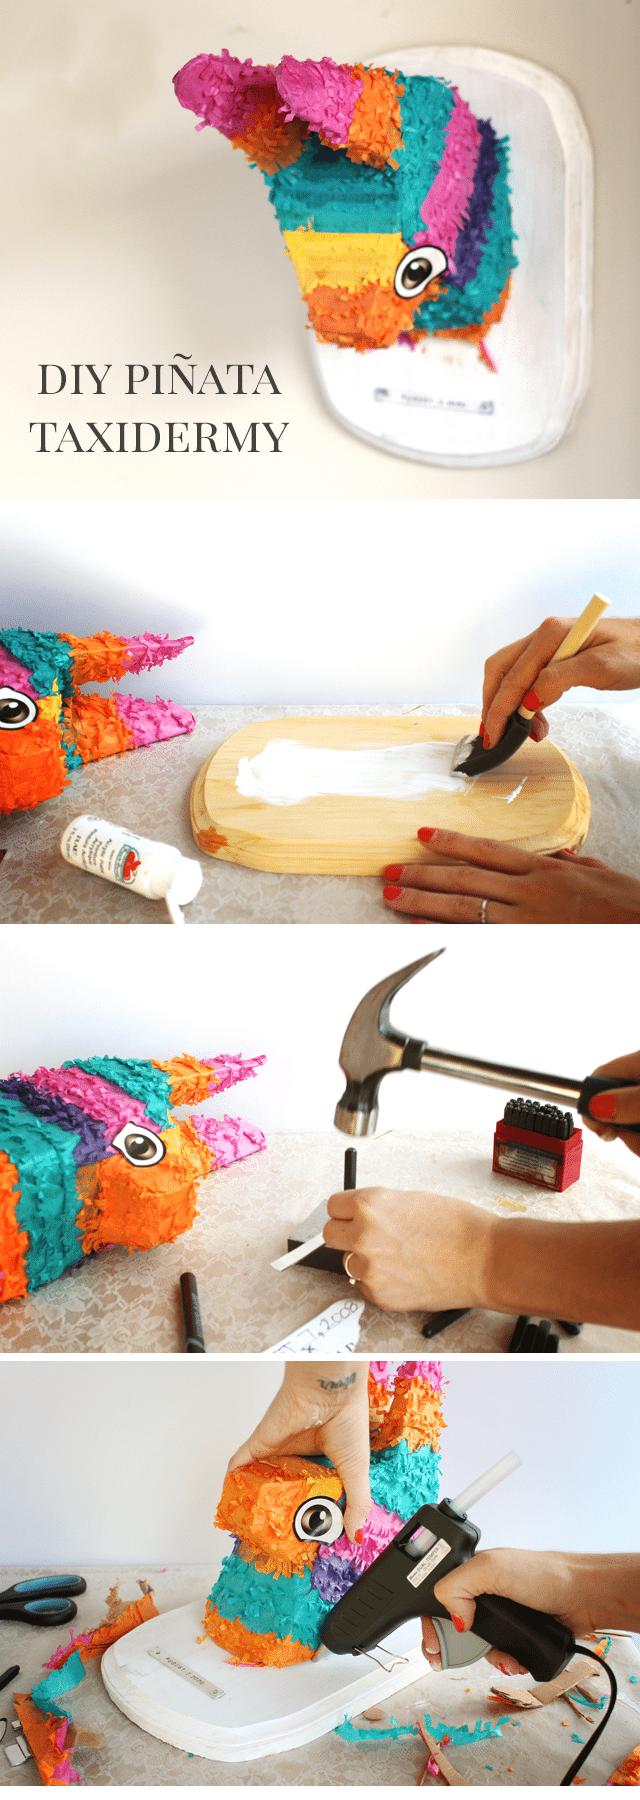 DIY Taxidermy Pinata Tutorial - Shrimp Salad Circus